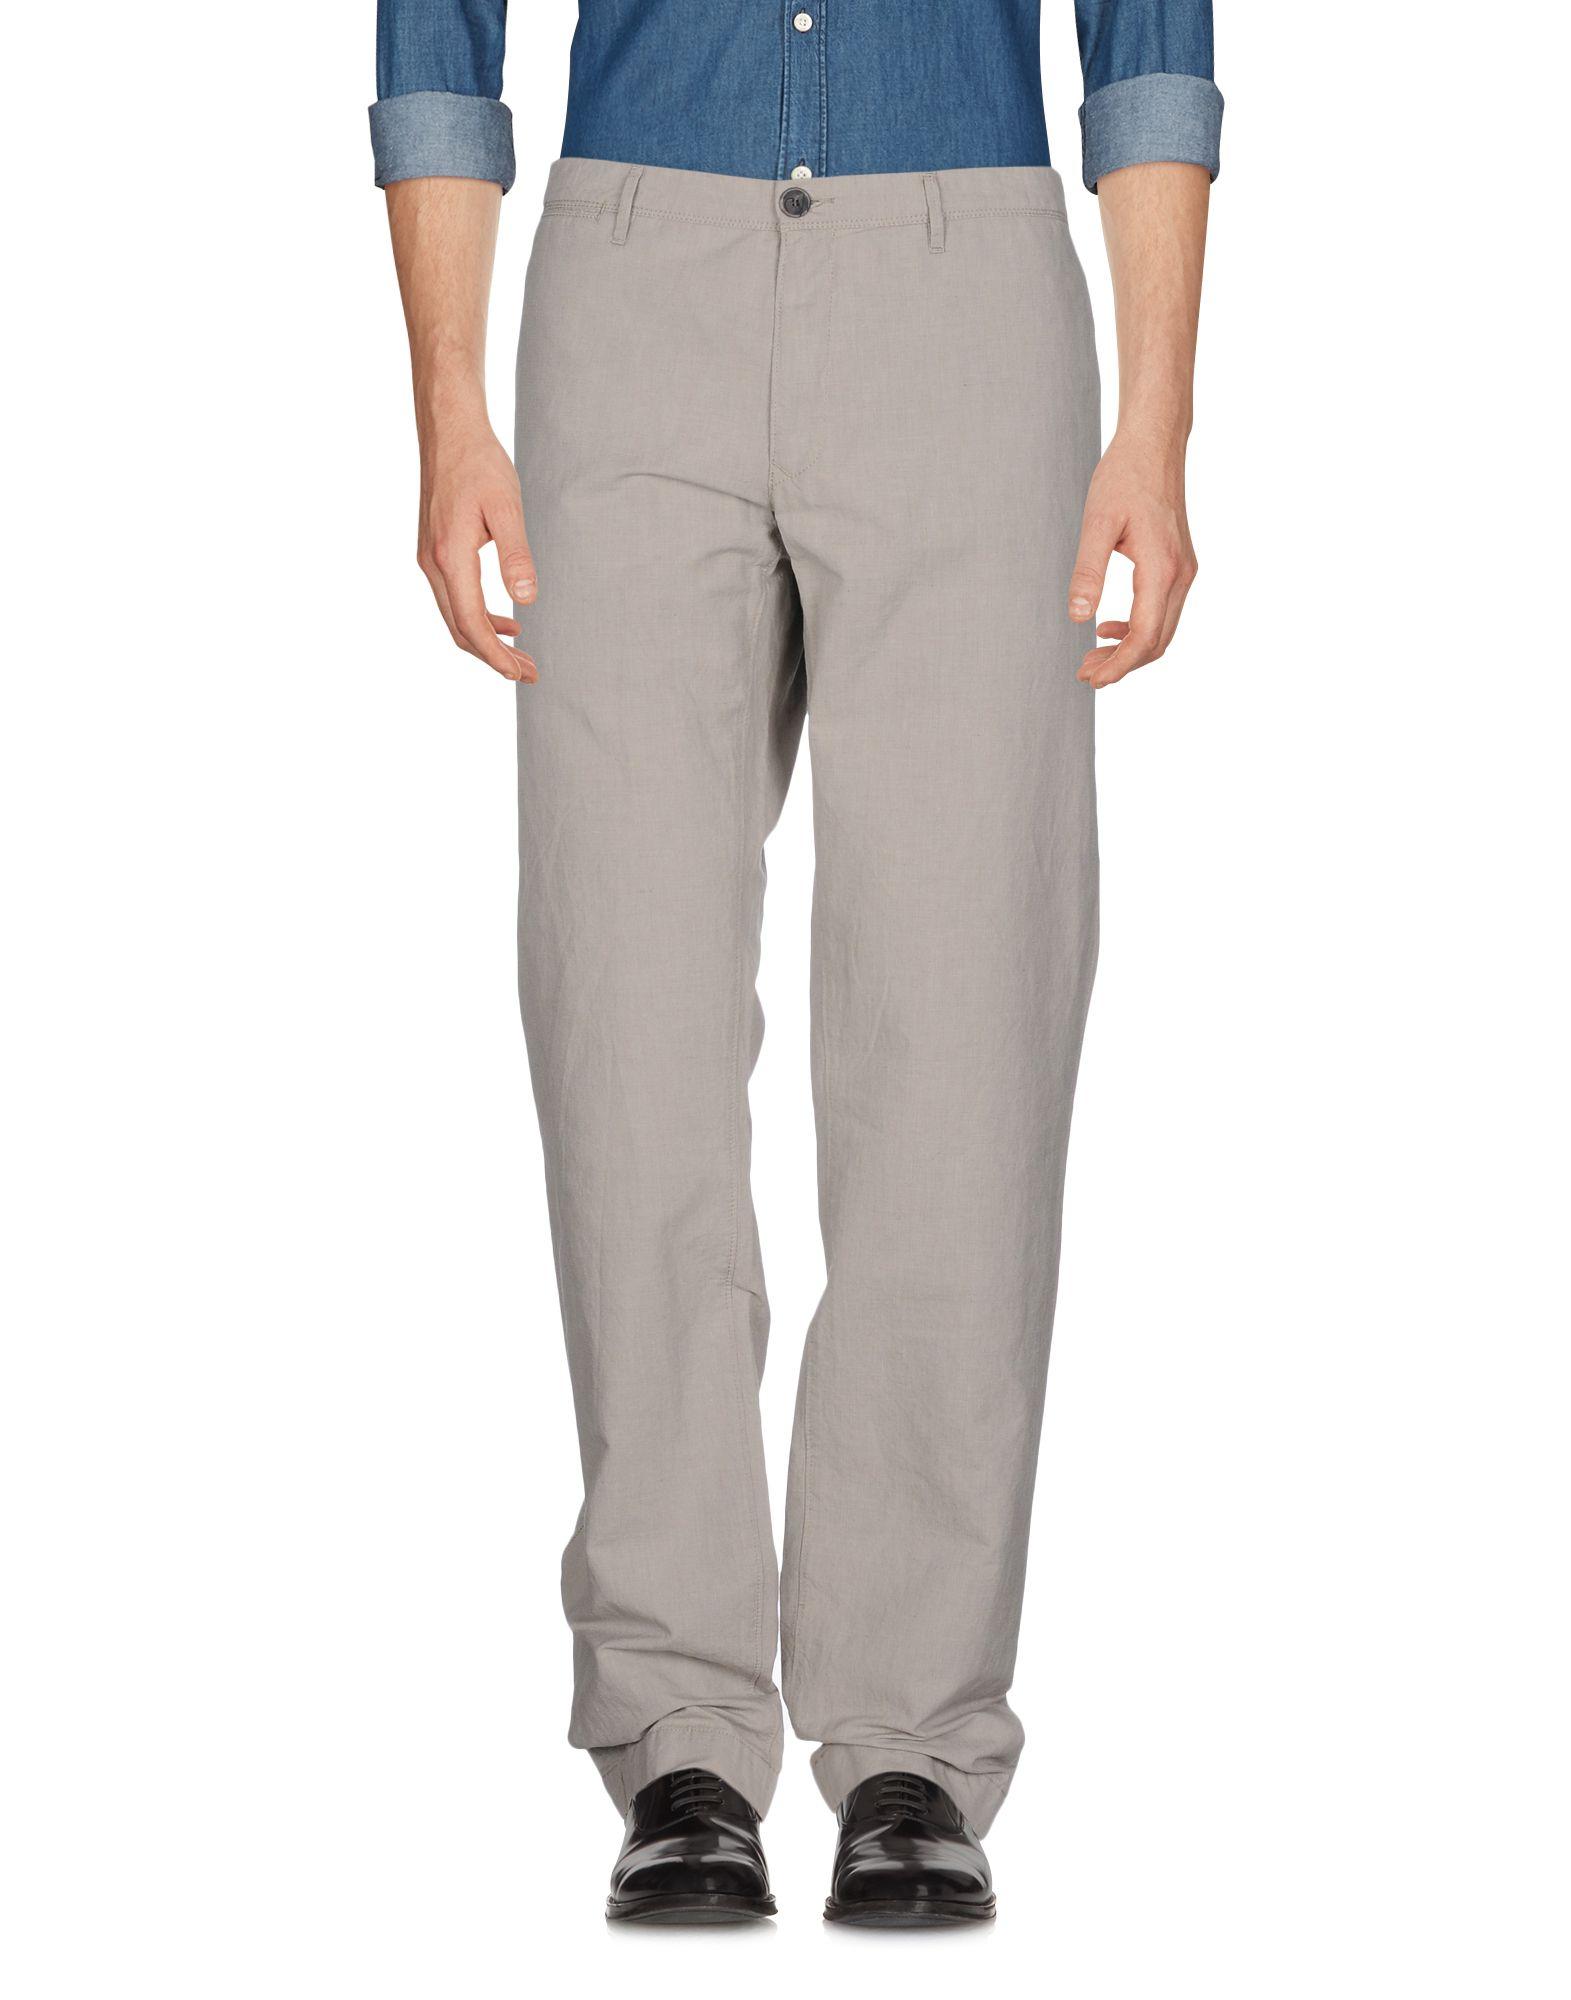 SIVIGLIA WHITE Herren Hose Farbe Grau Größe 14